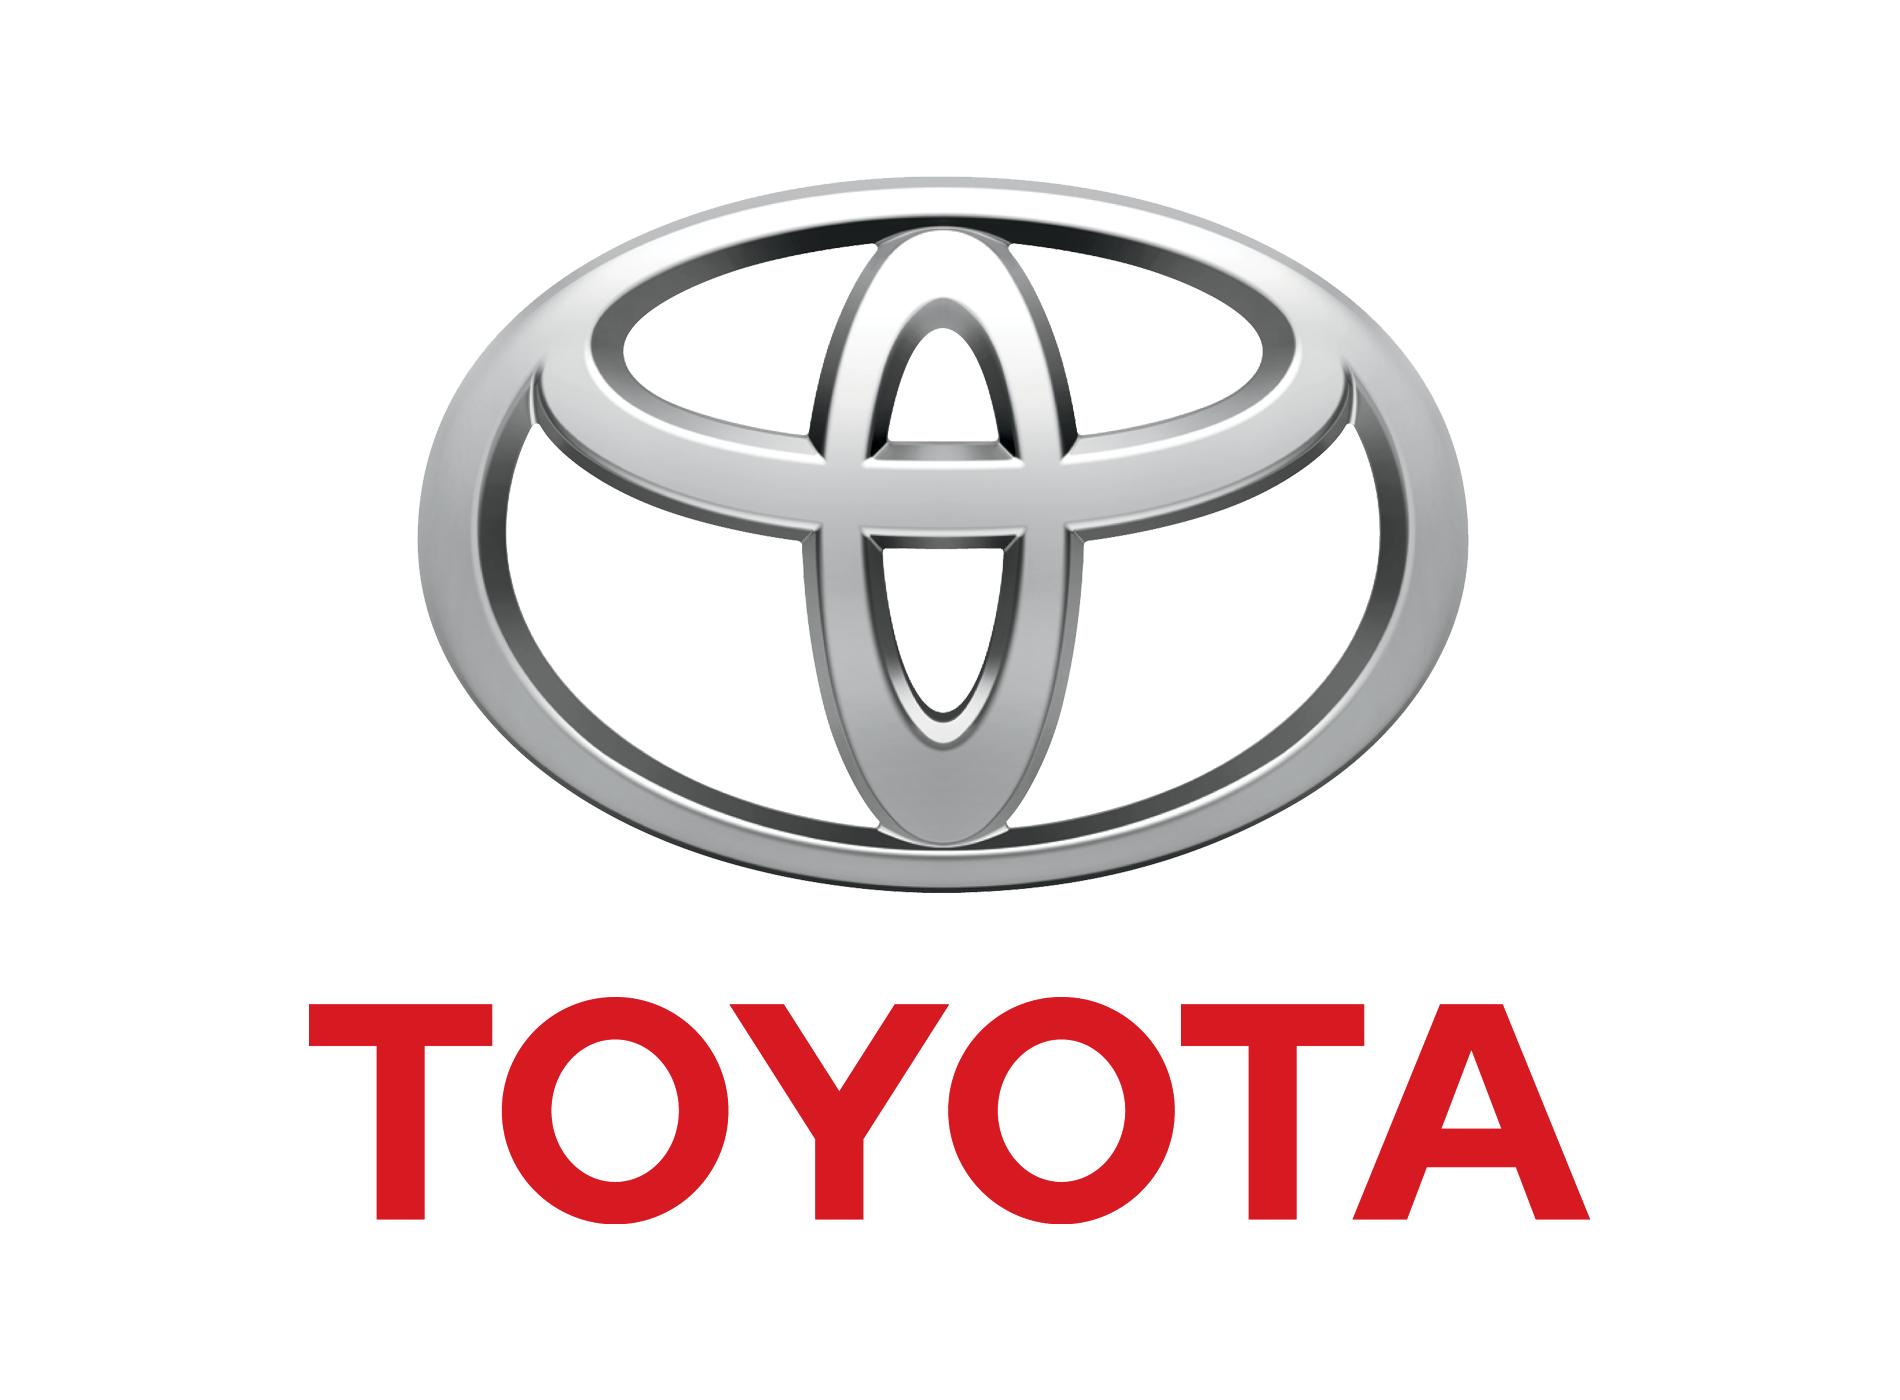 Toyota-groß.jpg